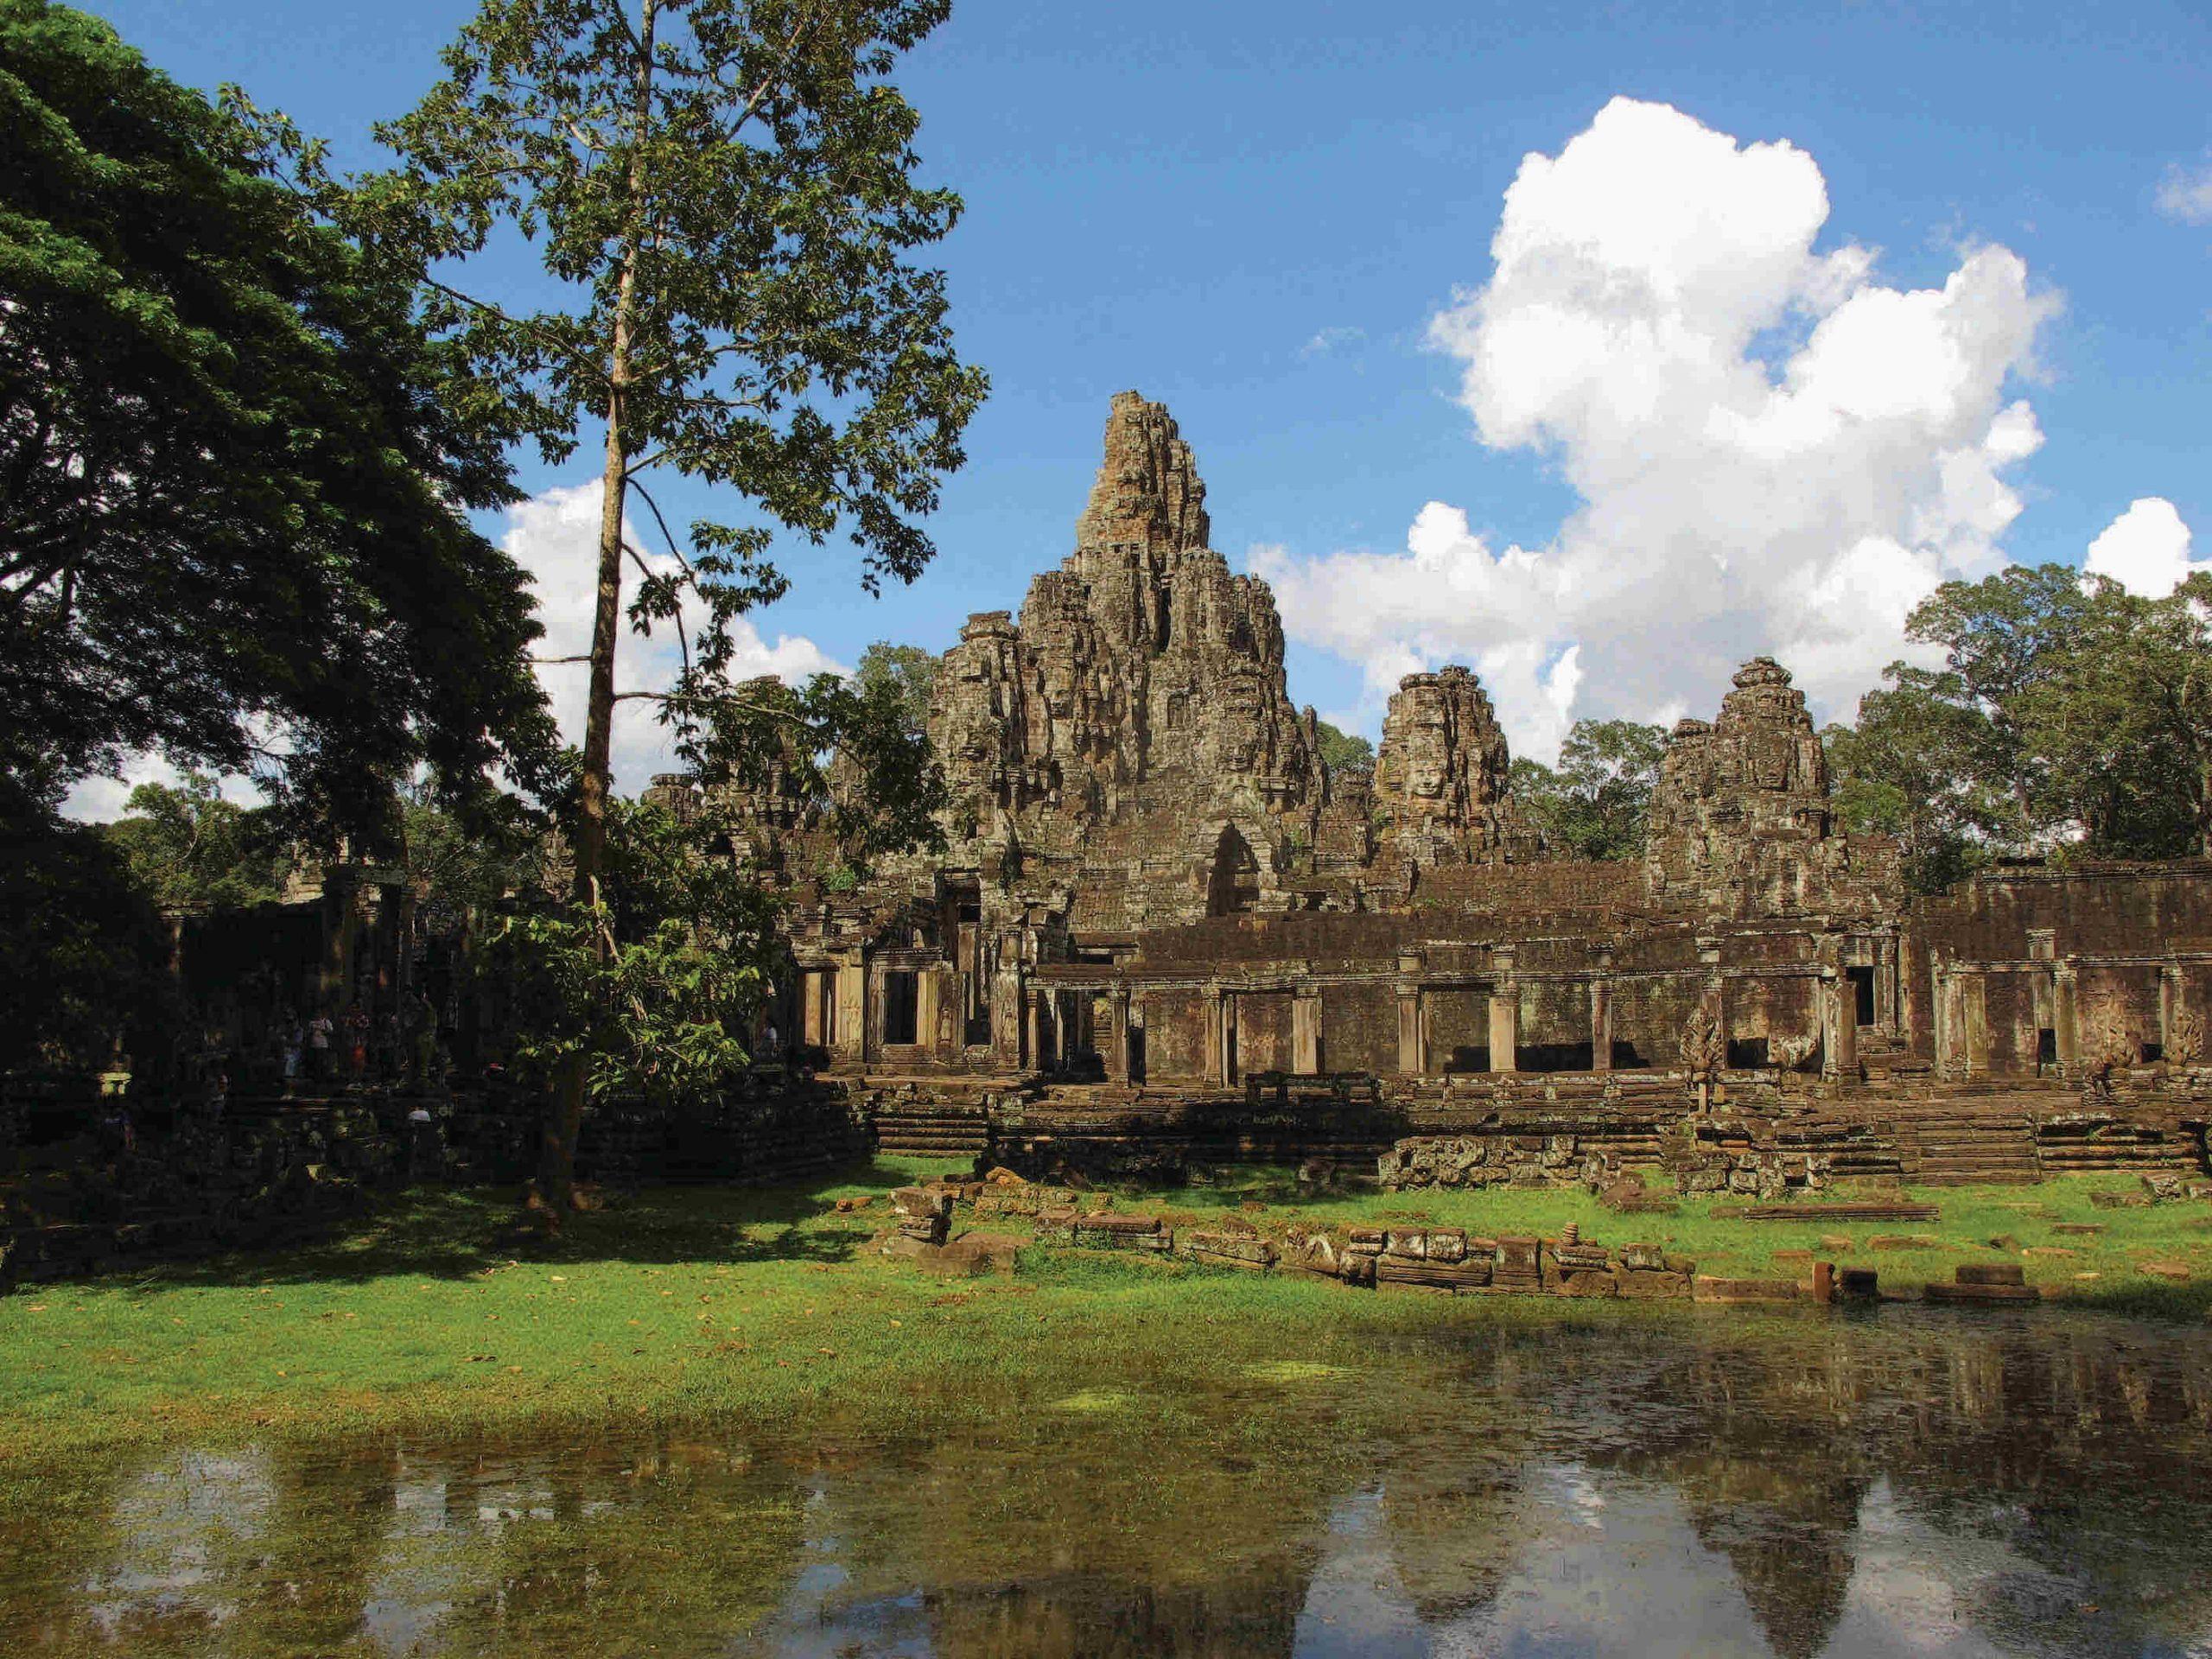 school_expedition_cambodia_trek_historic_temples-1